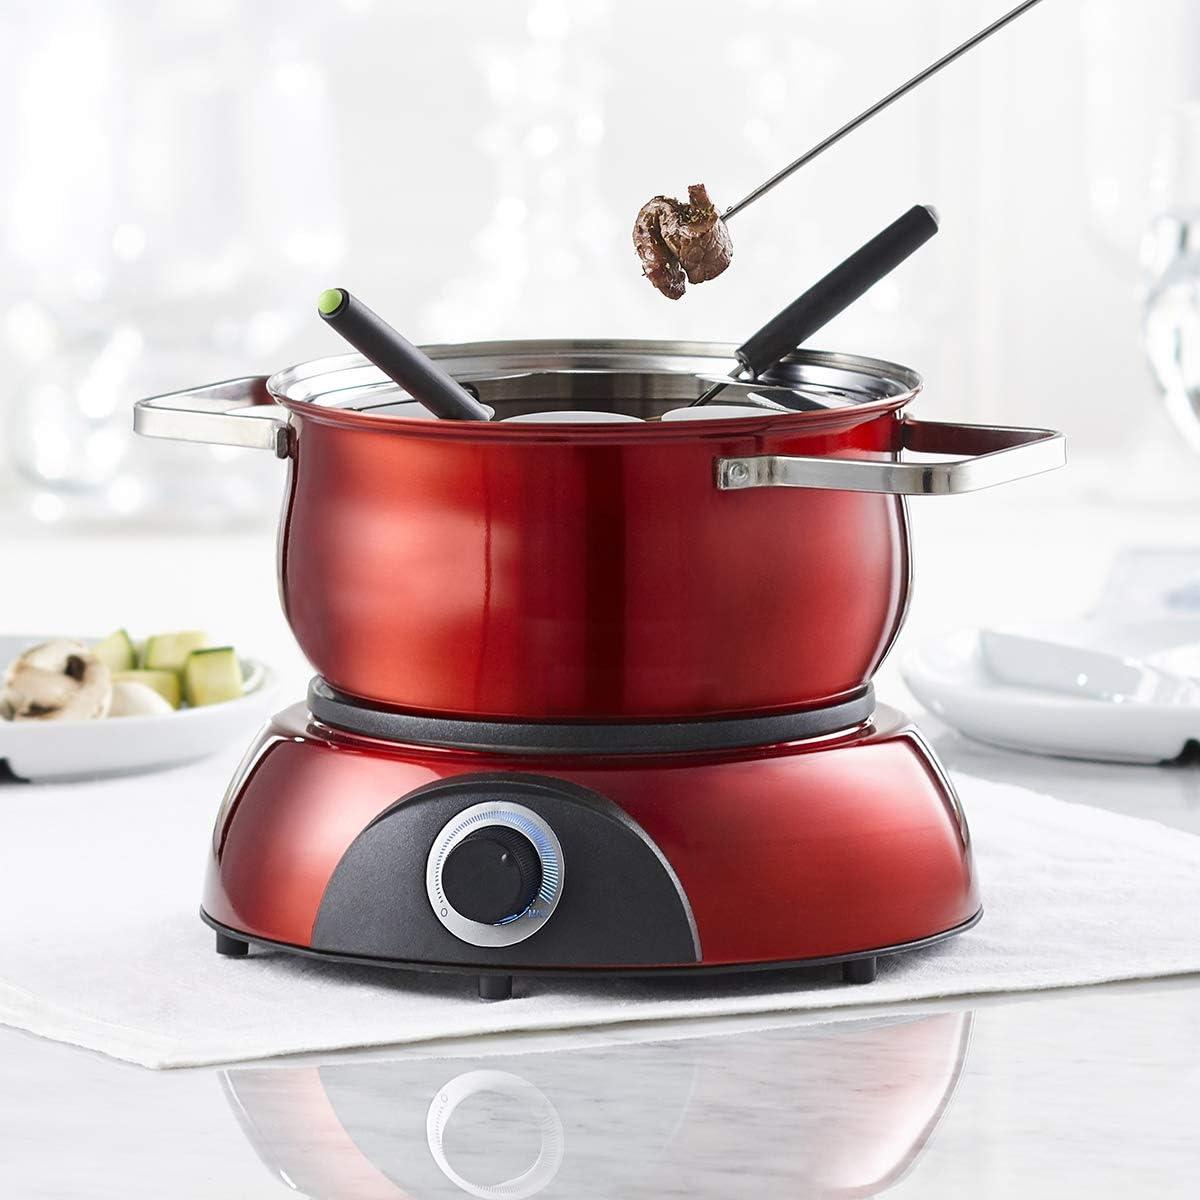 Fire-maple 1L Ultralight Titanium Kettle Outdoor Coffee Kettle Induction Cooker Kettle Camping Teapot Cookware